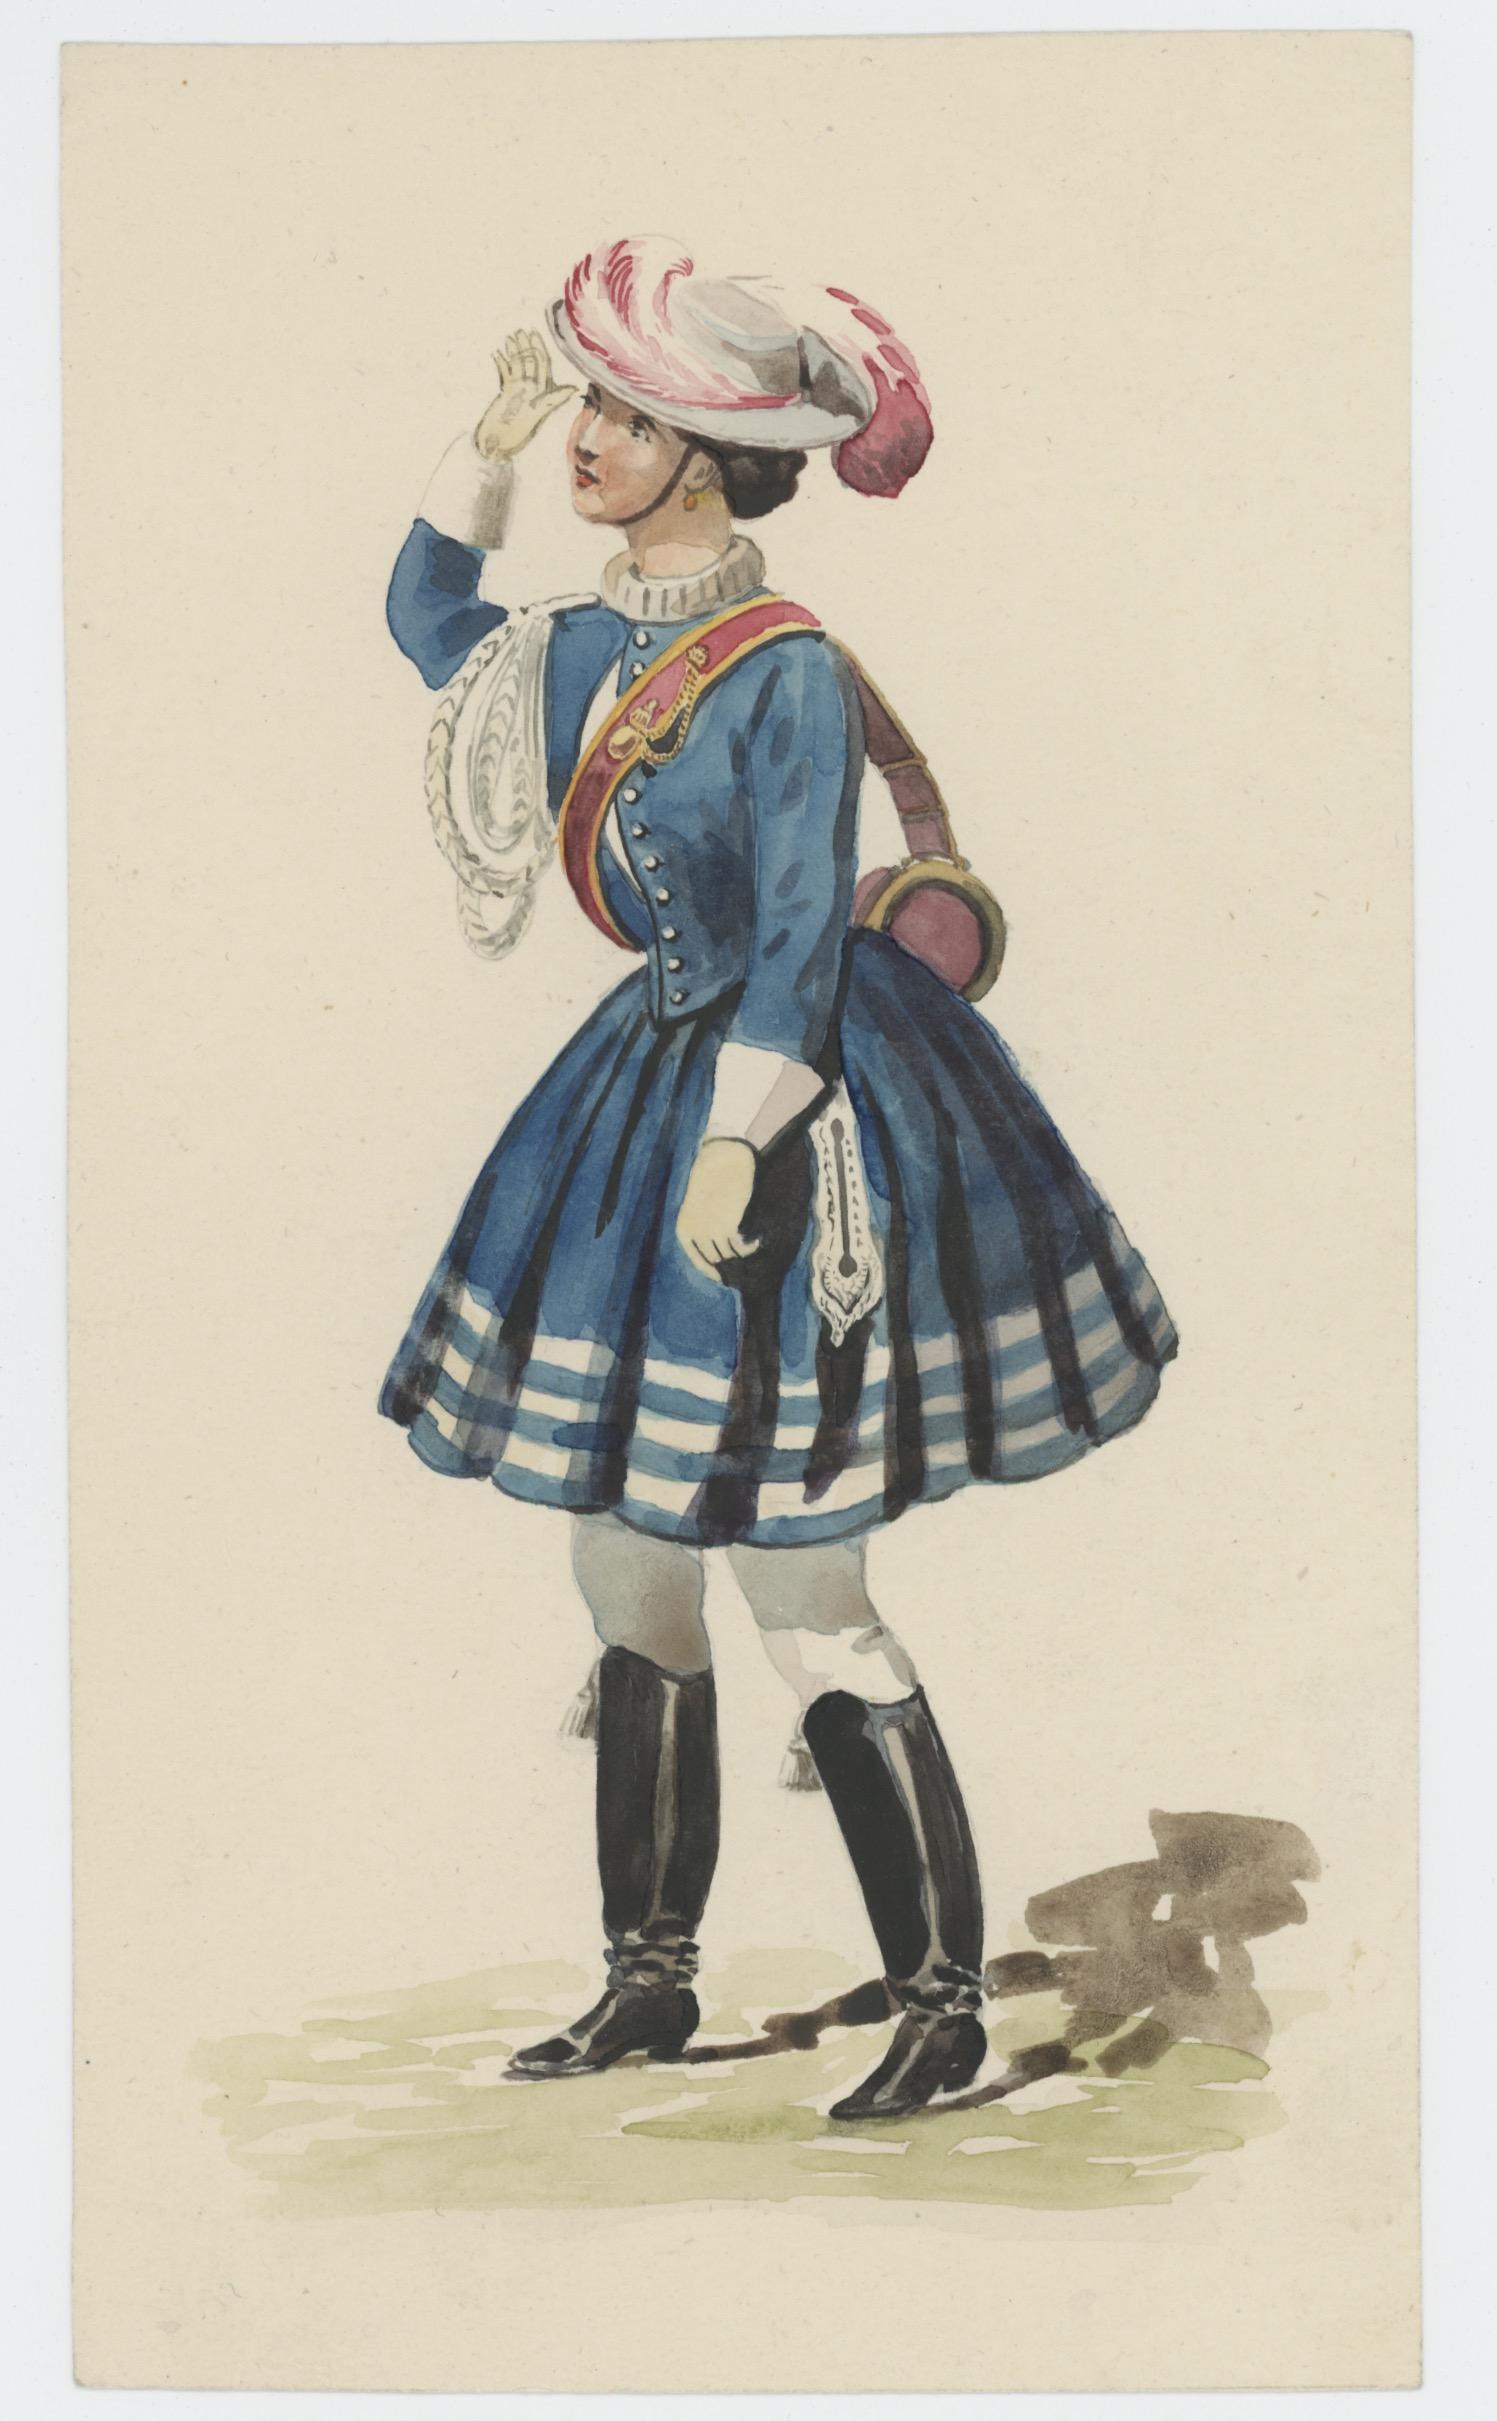 Dessin crayon rehaussé - Cantinière - Second Empire - Napoleon III - Uniforme - Aquarelle Originale - Cuirassier